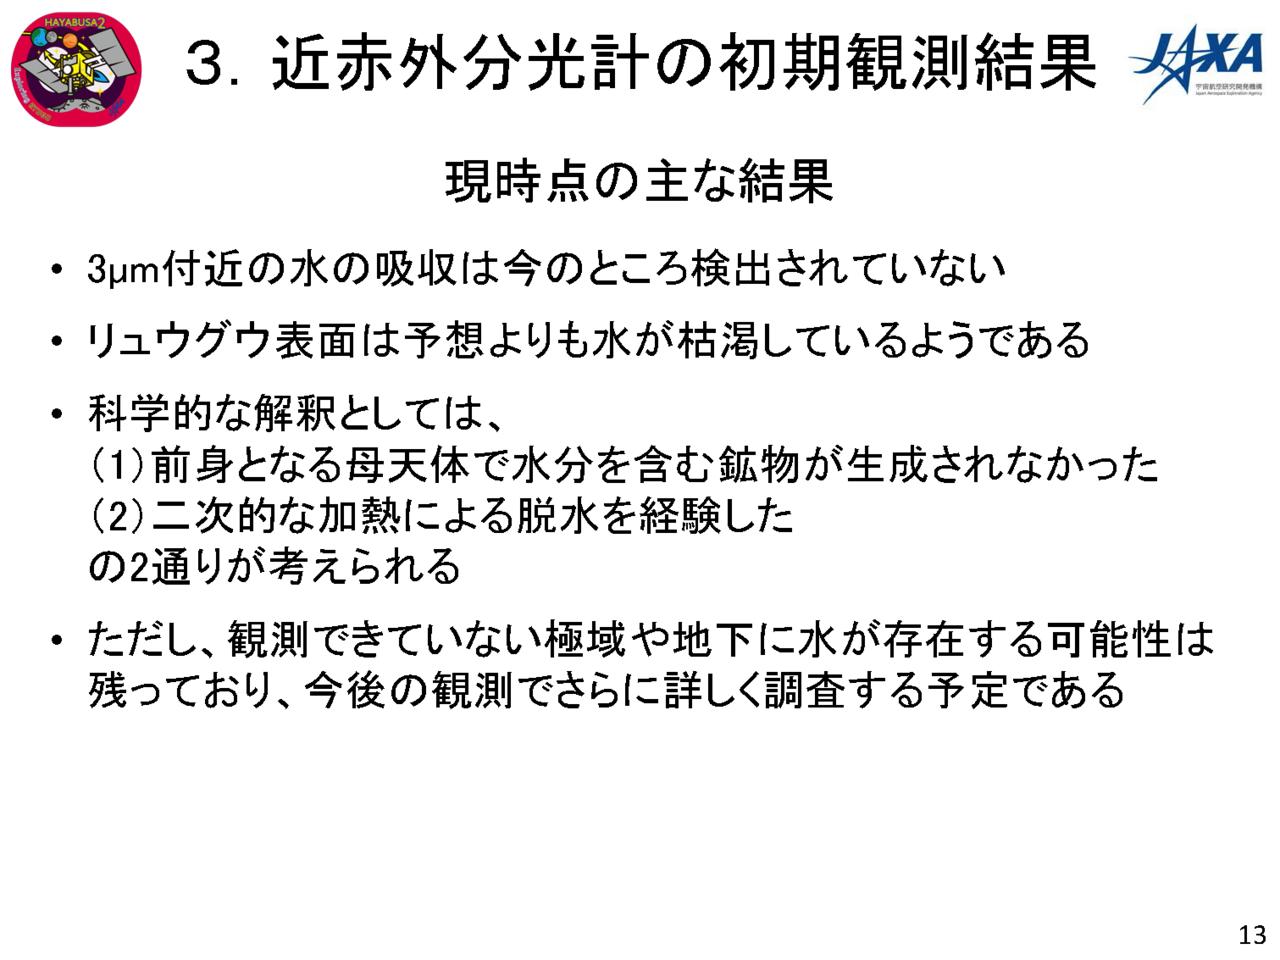 f:id:Imamura:20180802145933p:plain